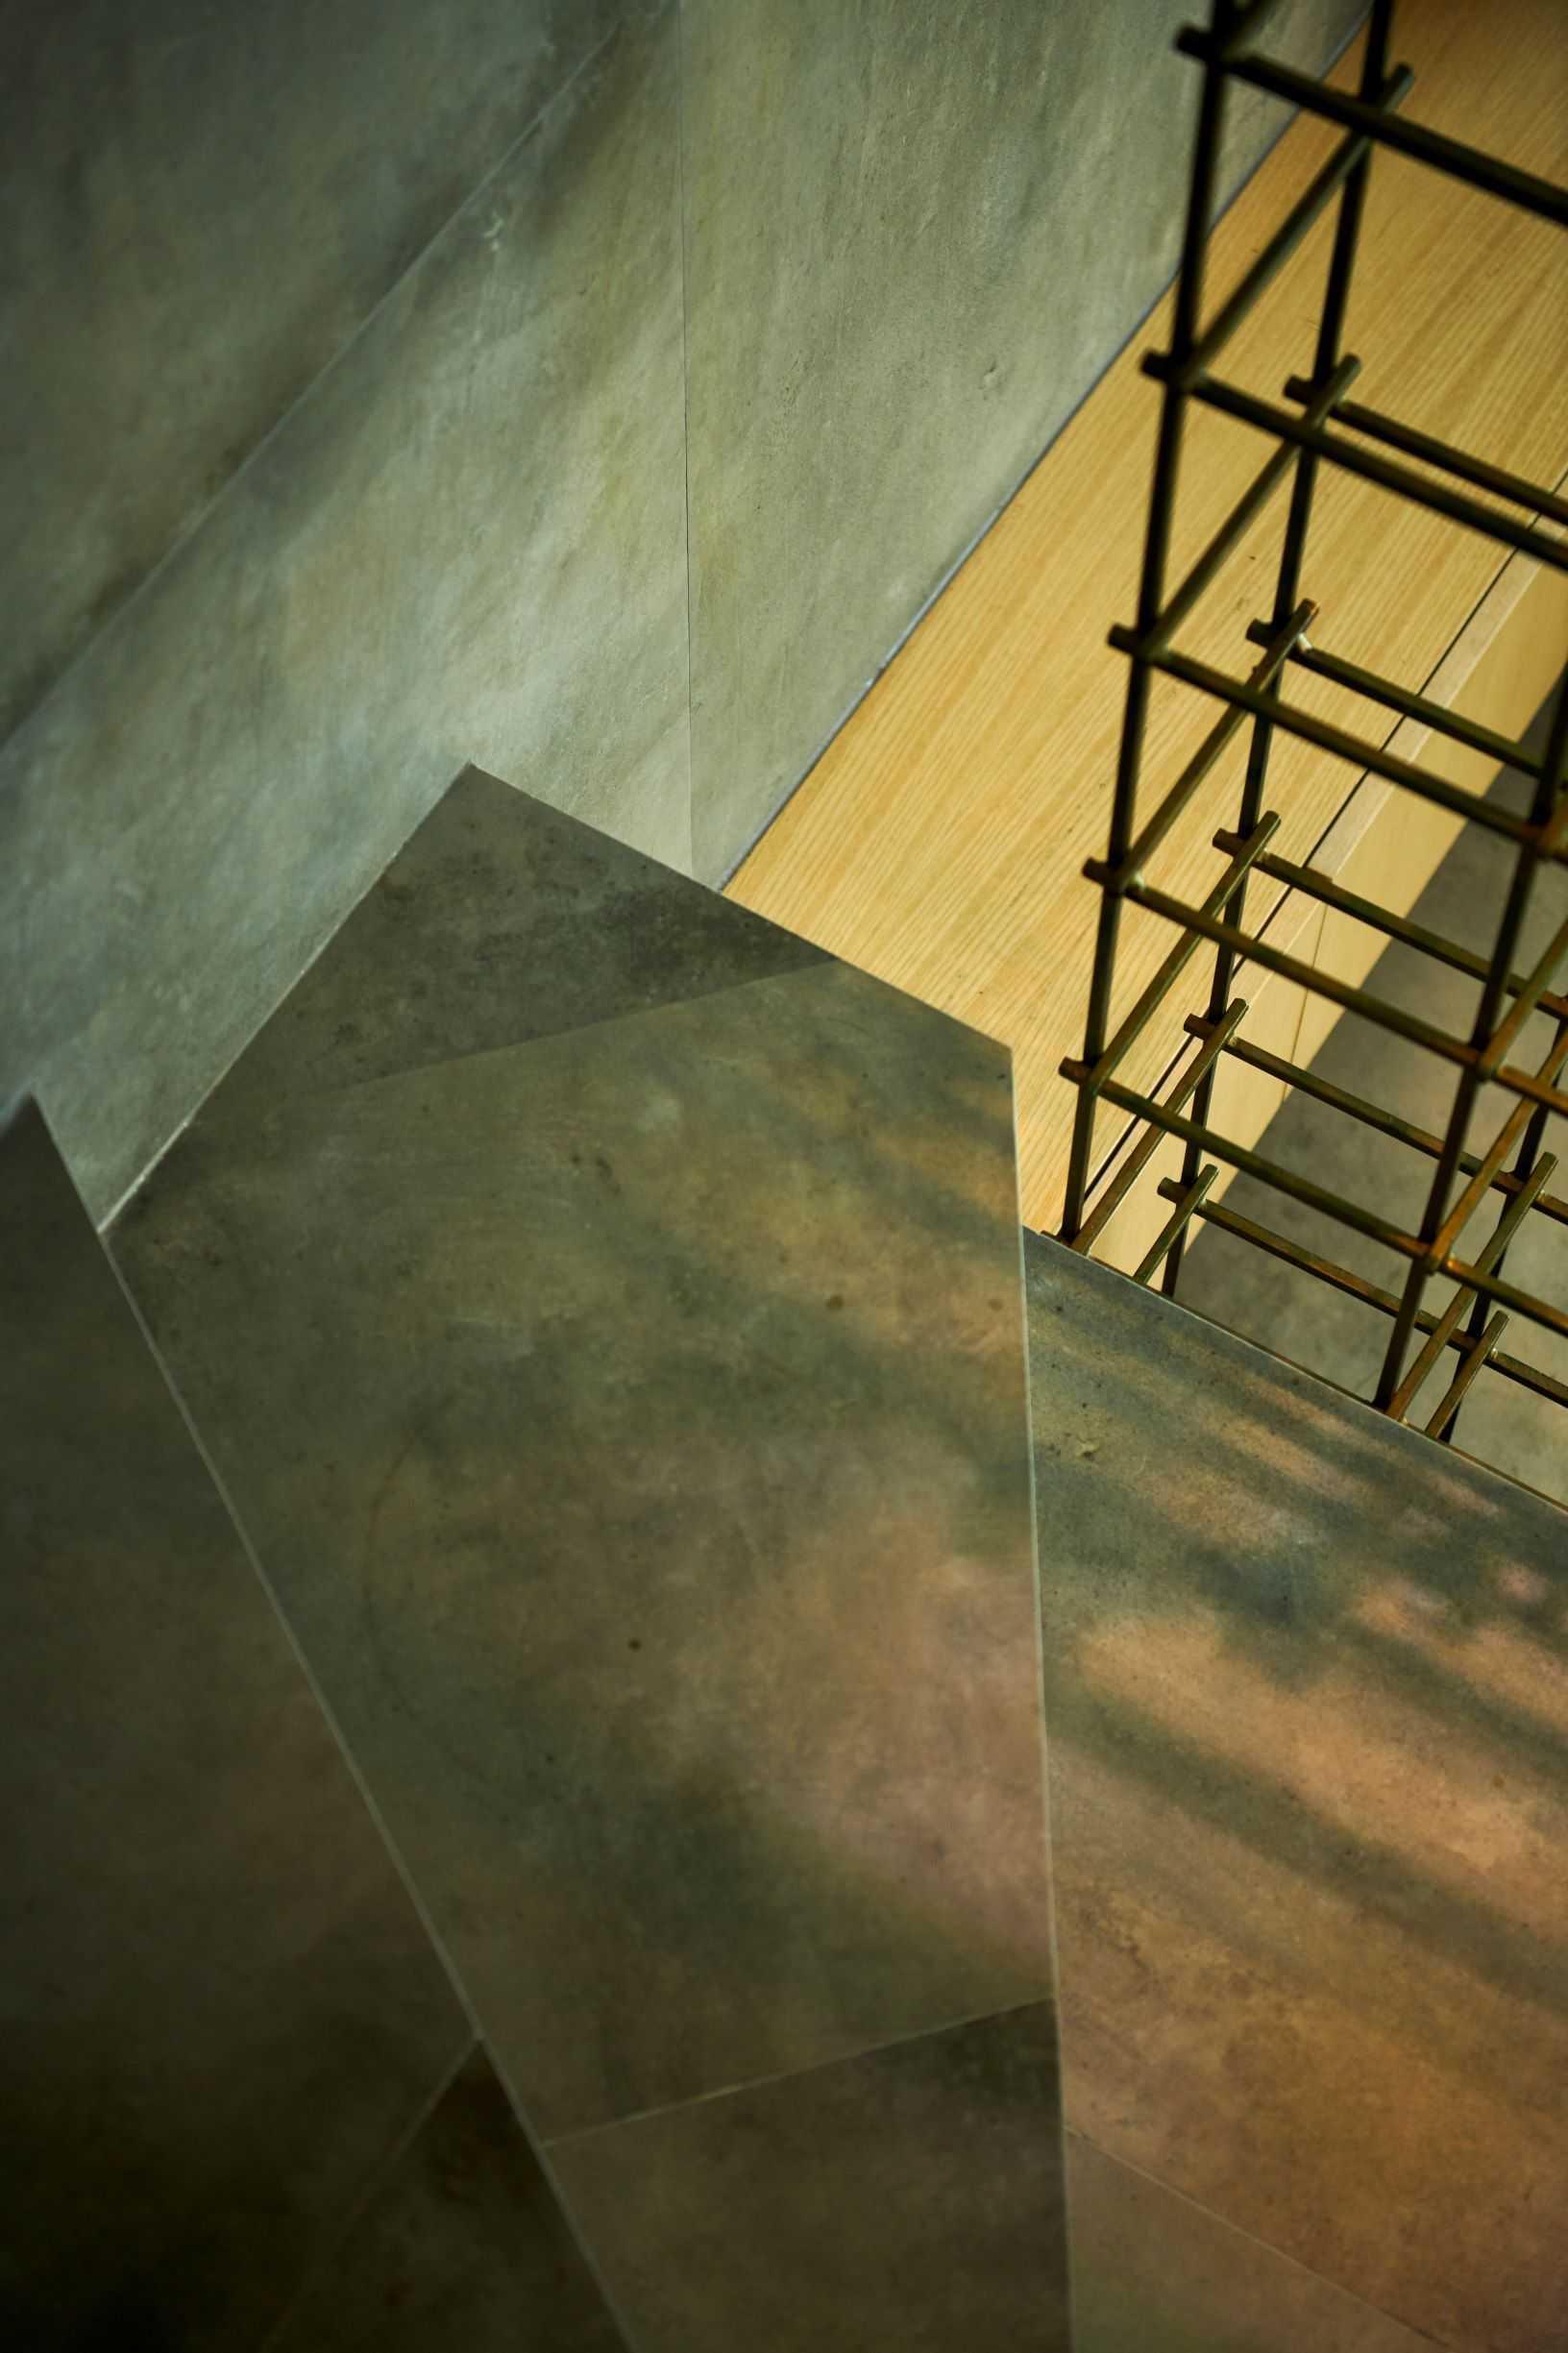 Hadivincent Architects Tb Apartment Lippo Cikarang, Bekasi, Jawa Barat, Indonesia Lippo Cikarang, Bekasi, Jawa Barat, Indonesia Hadi-Vincent-Architects-Tb-Apartment   70999